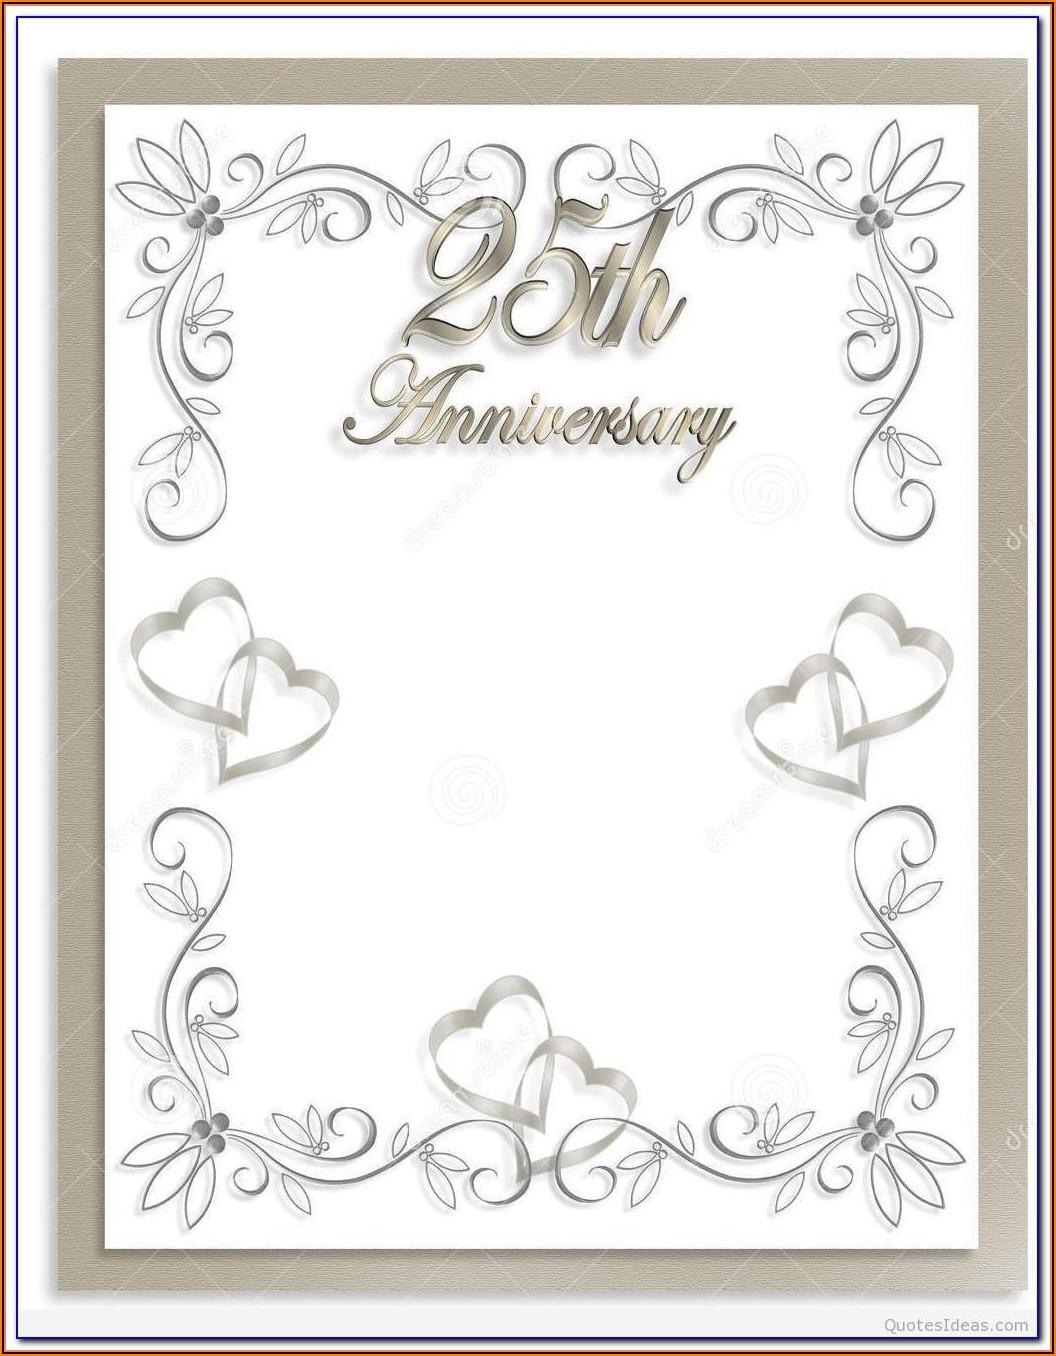 25th Wedding Anniversary Certificate Template